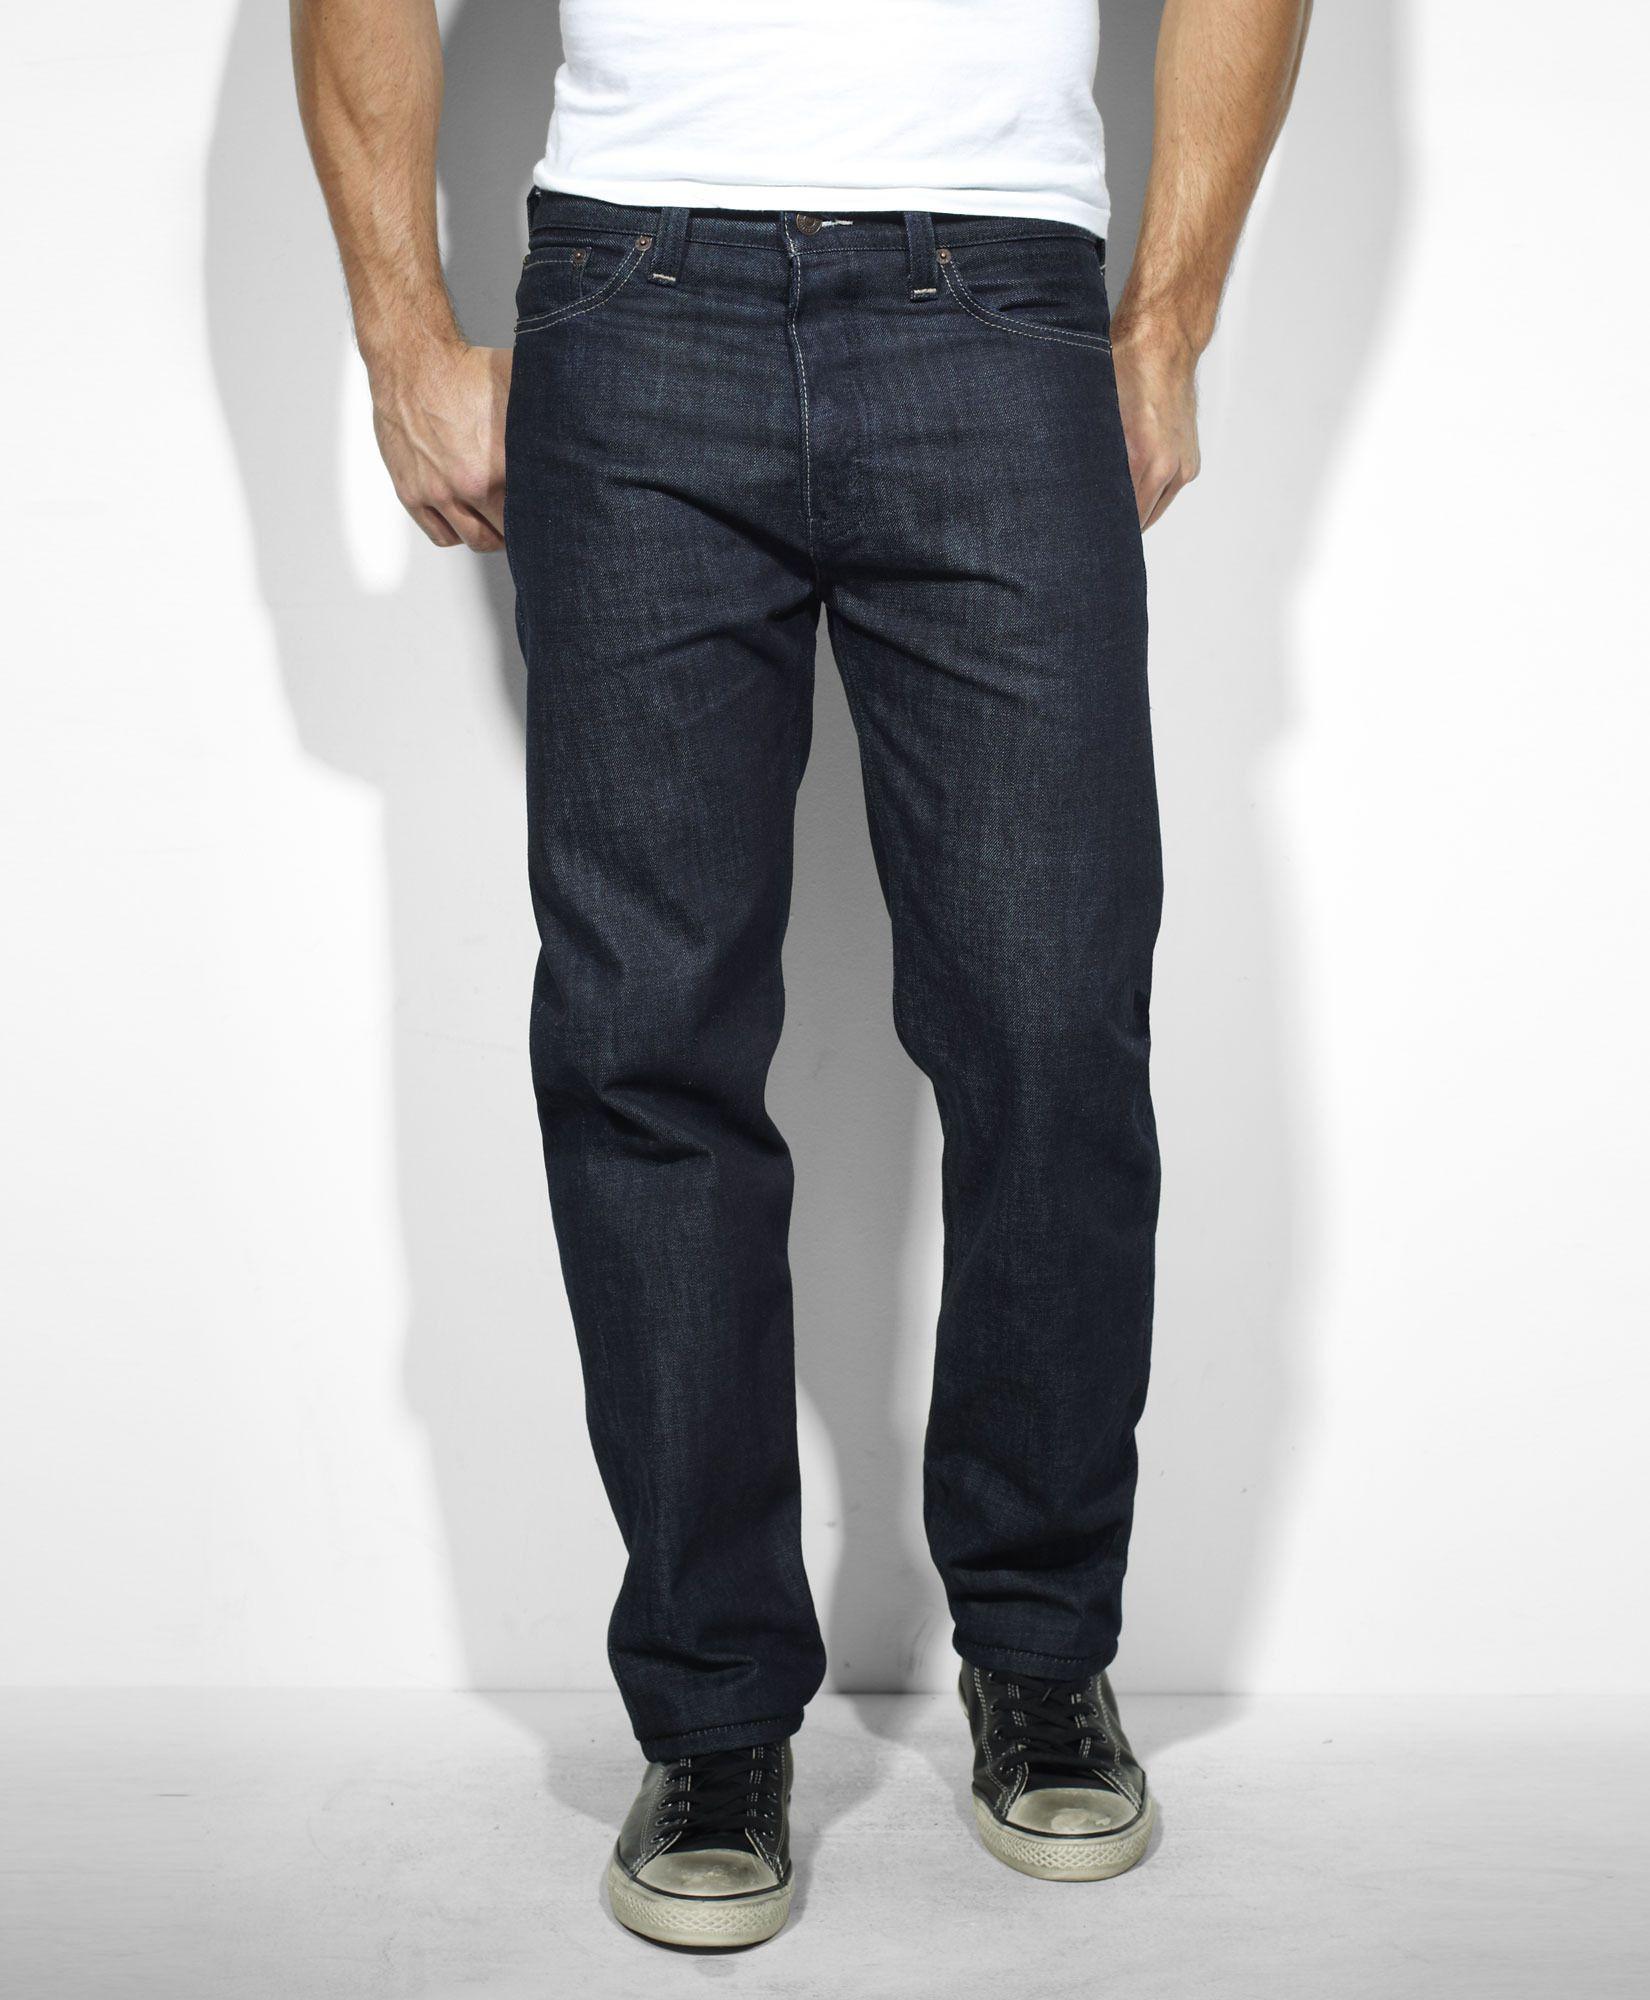 Levi's 562™ Loose Taper Jeans Rigid Golden Jeans